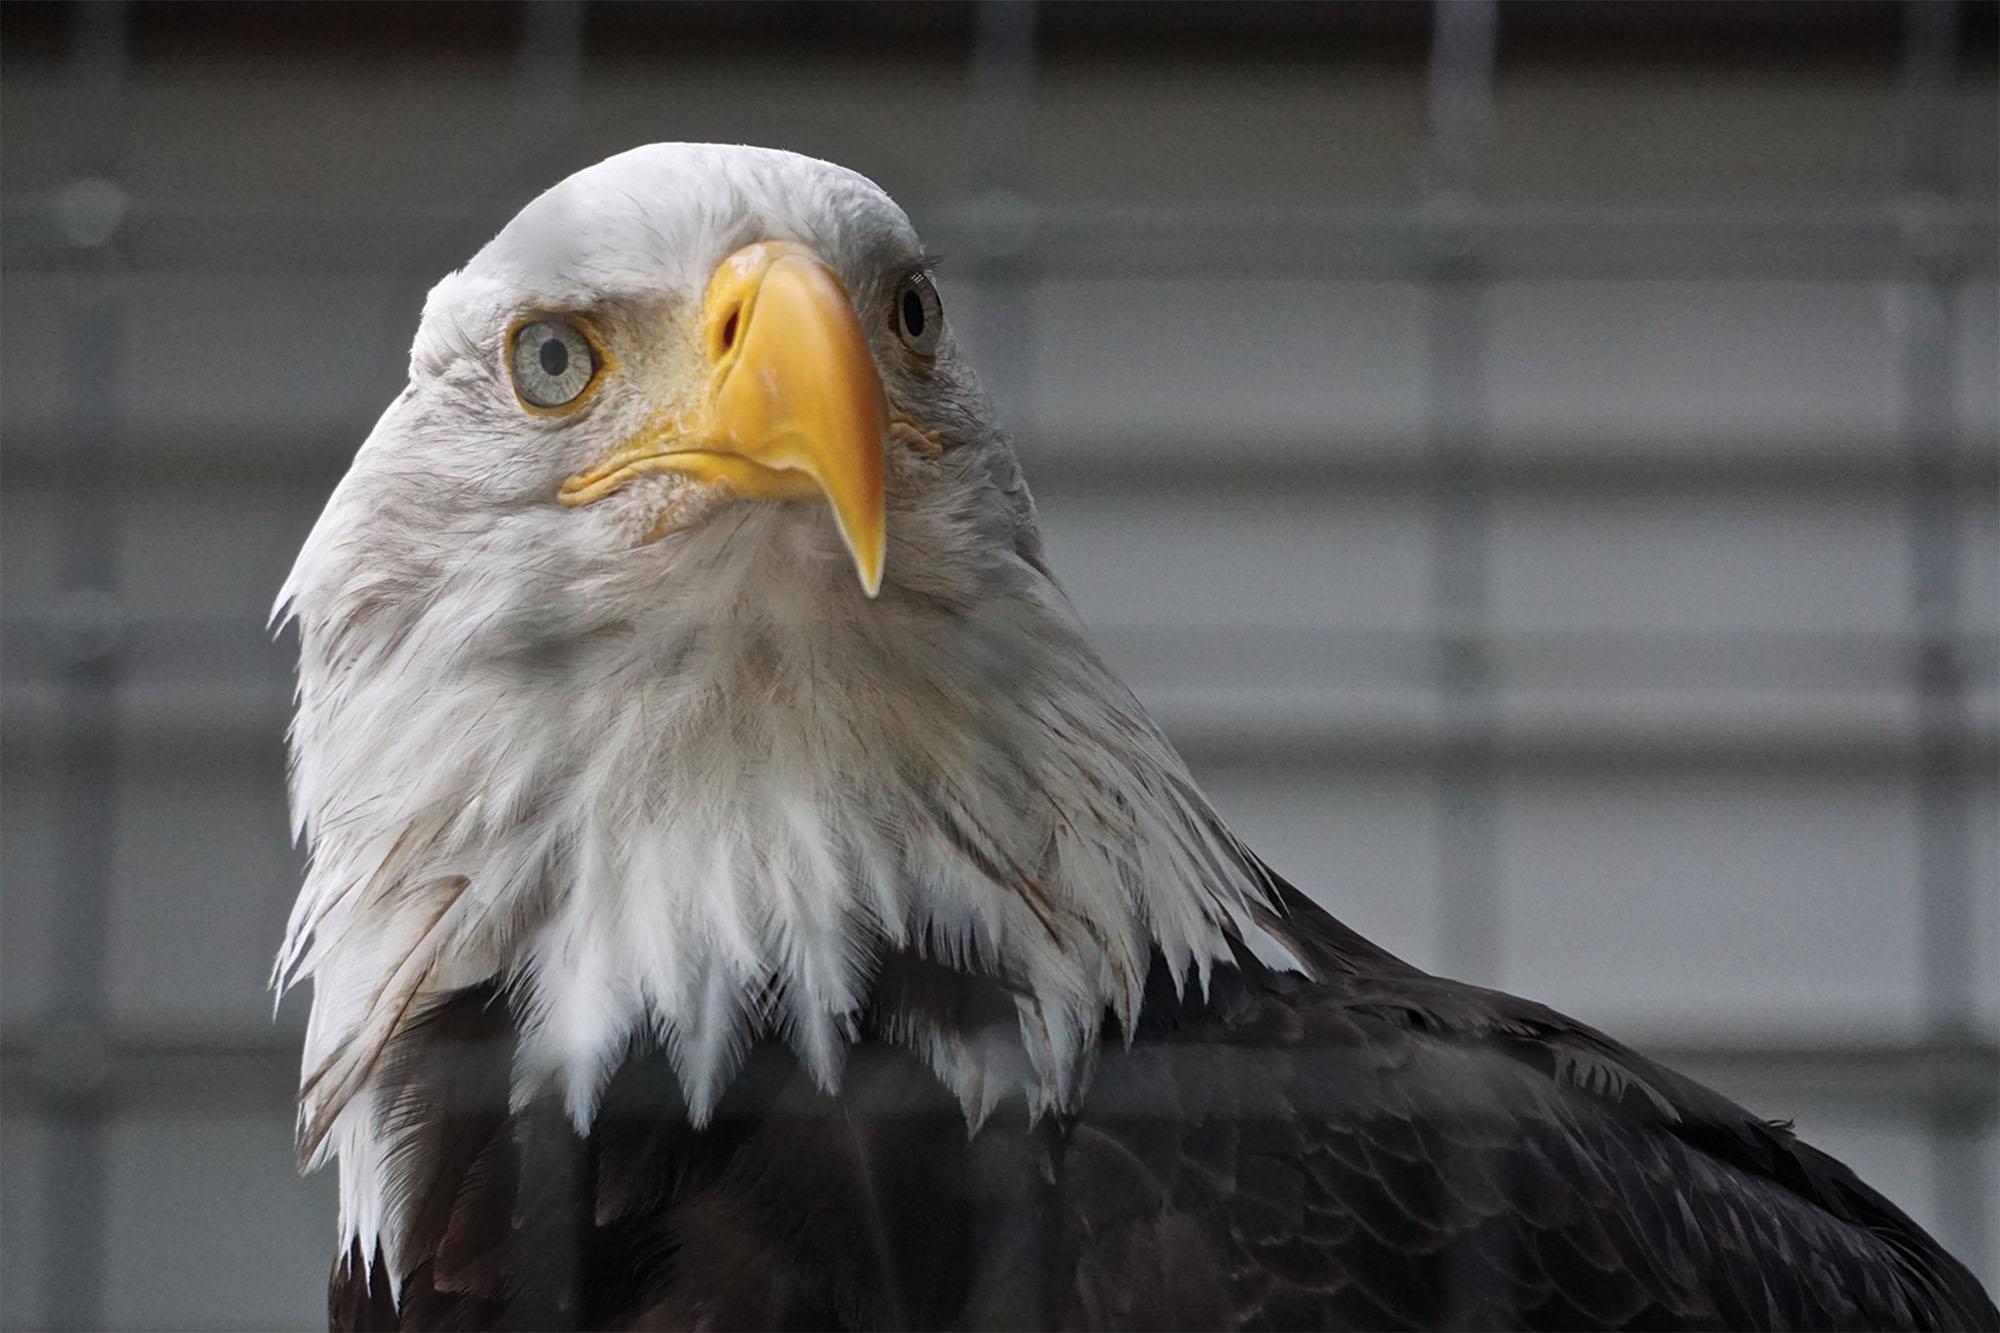 A Bald Eagle is shown behind mesh fencing at the Alaska Raptor Center. Linda Harms/Shutterstock